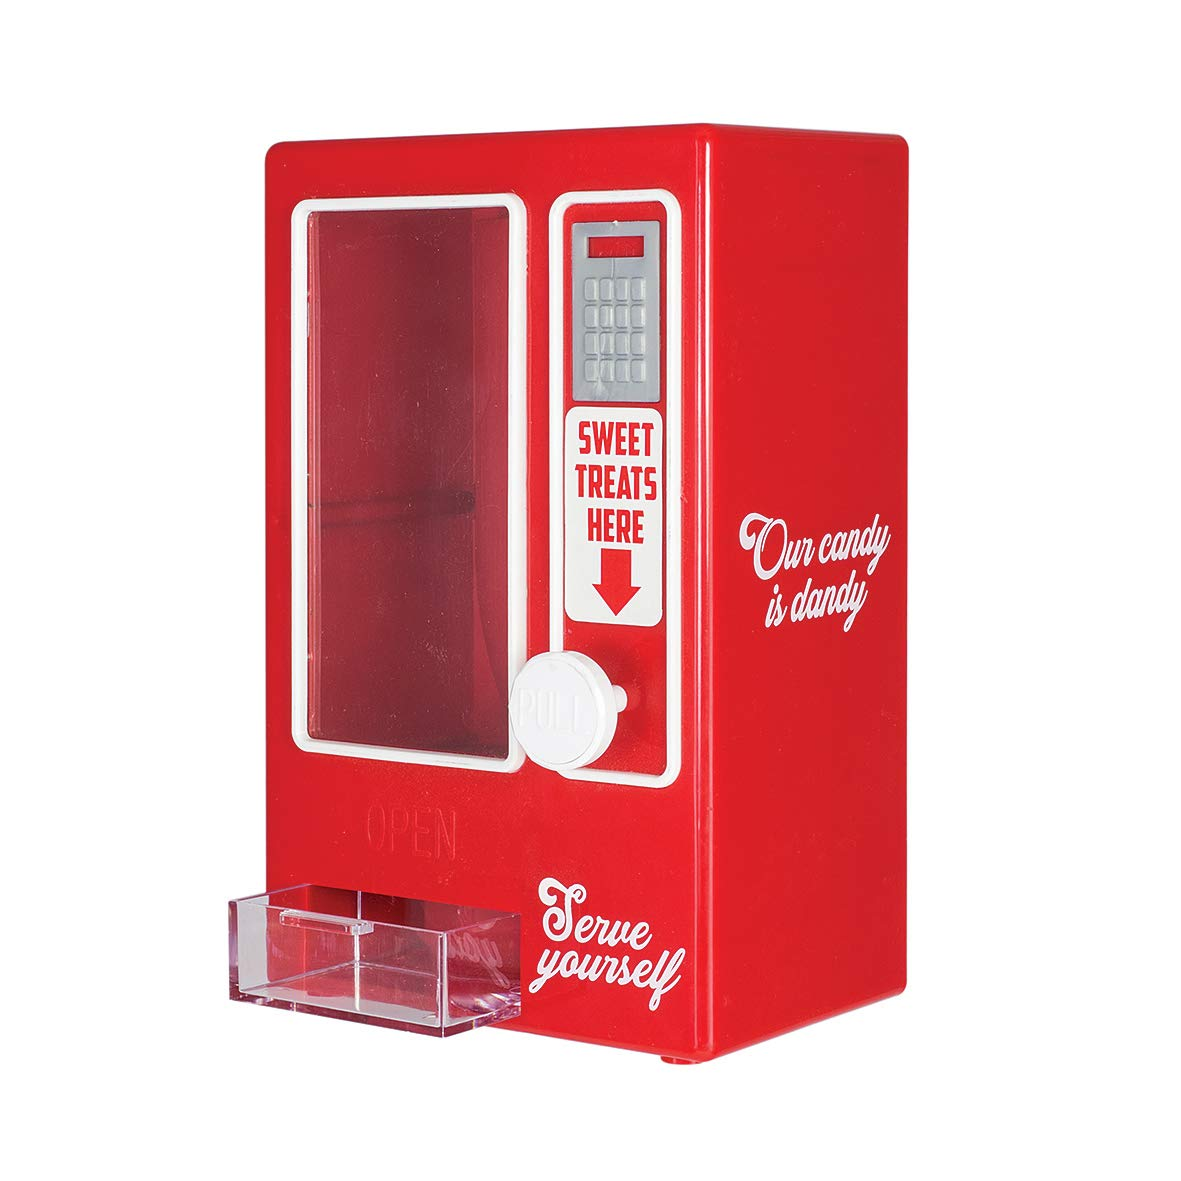 Vending Tabletop Dispenser Dispense Measures